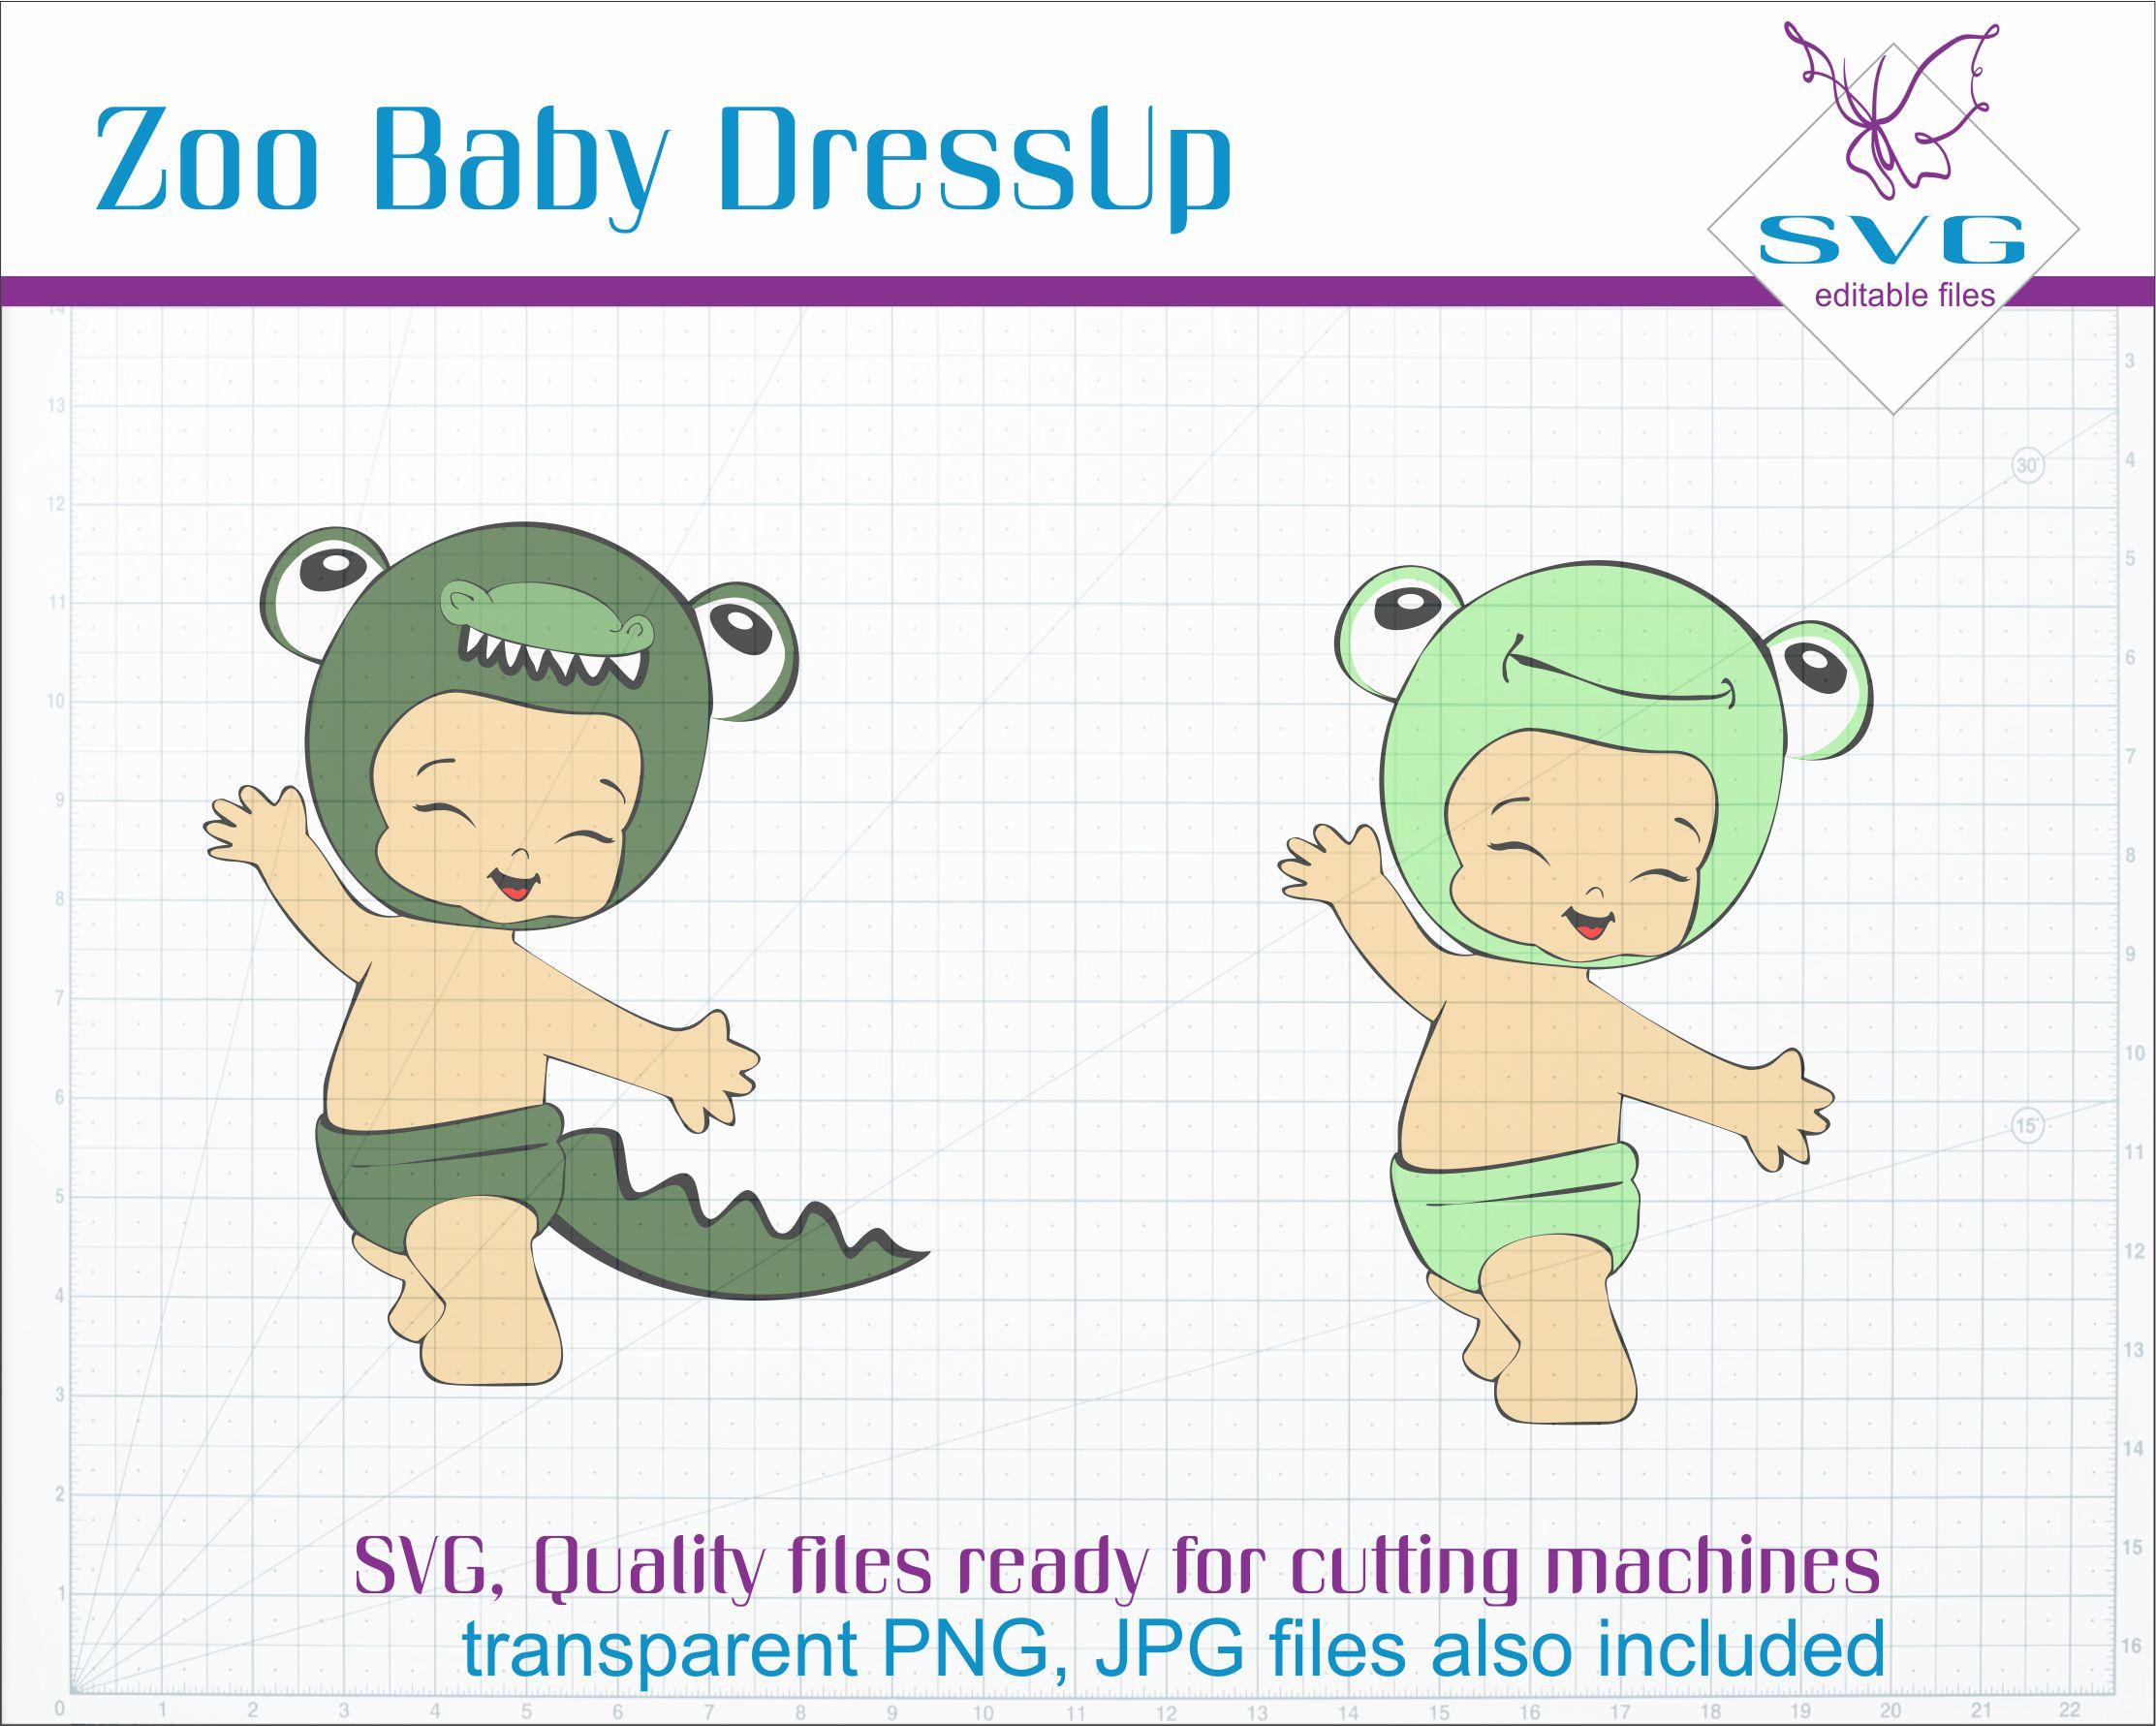 Zoo Baby Dressup example image 7